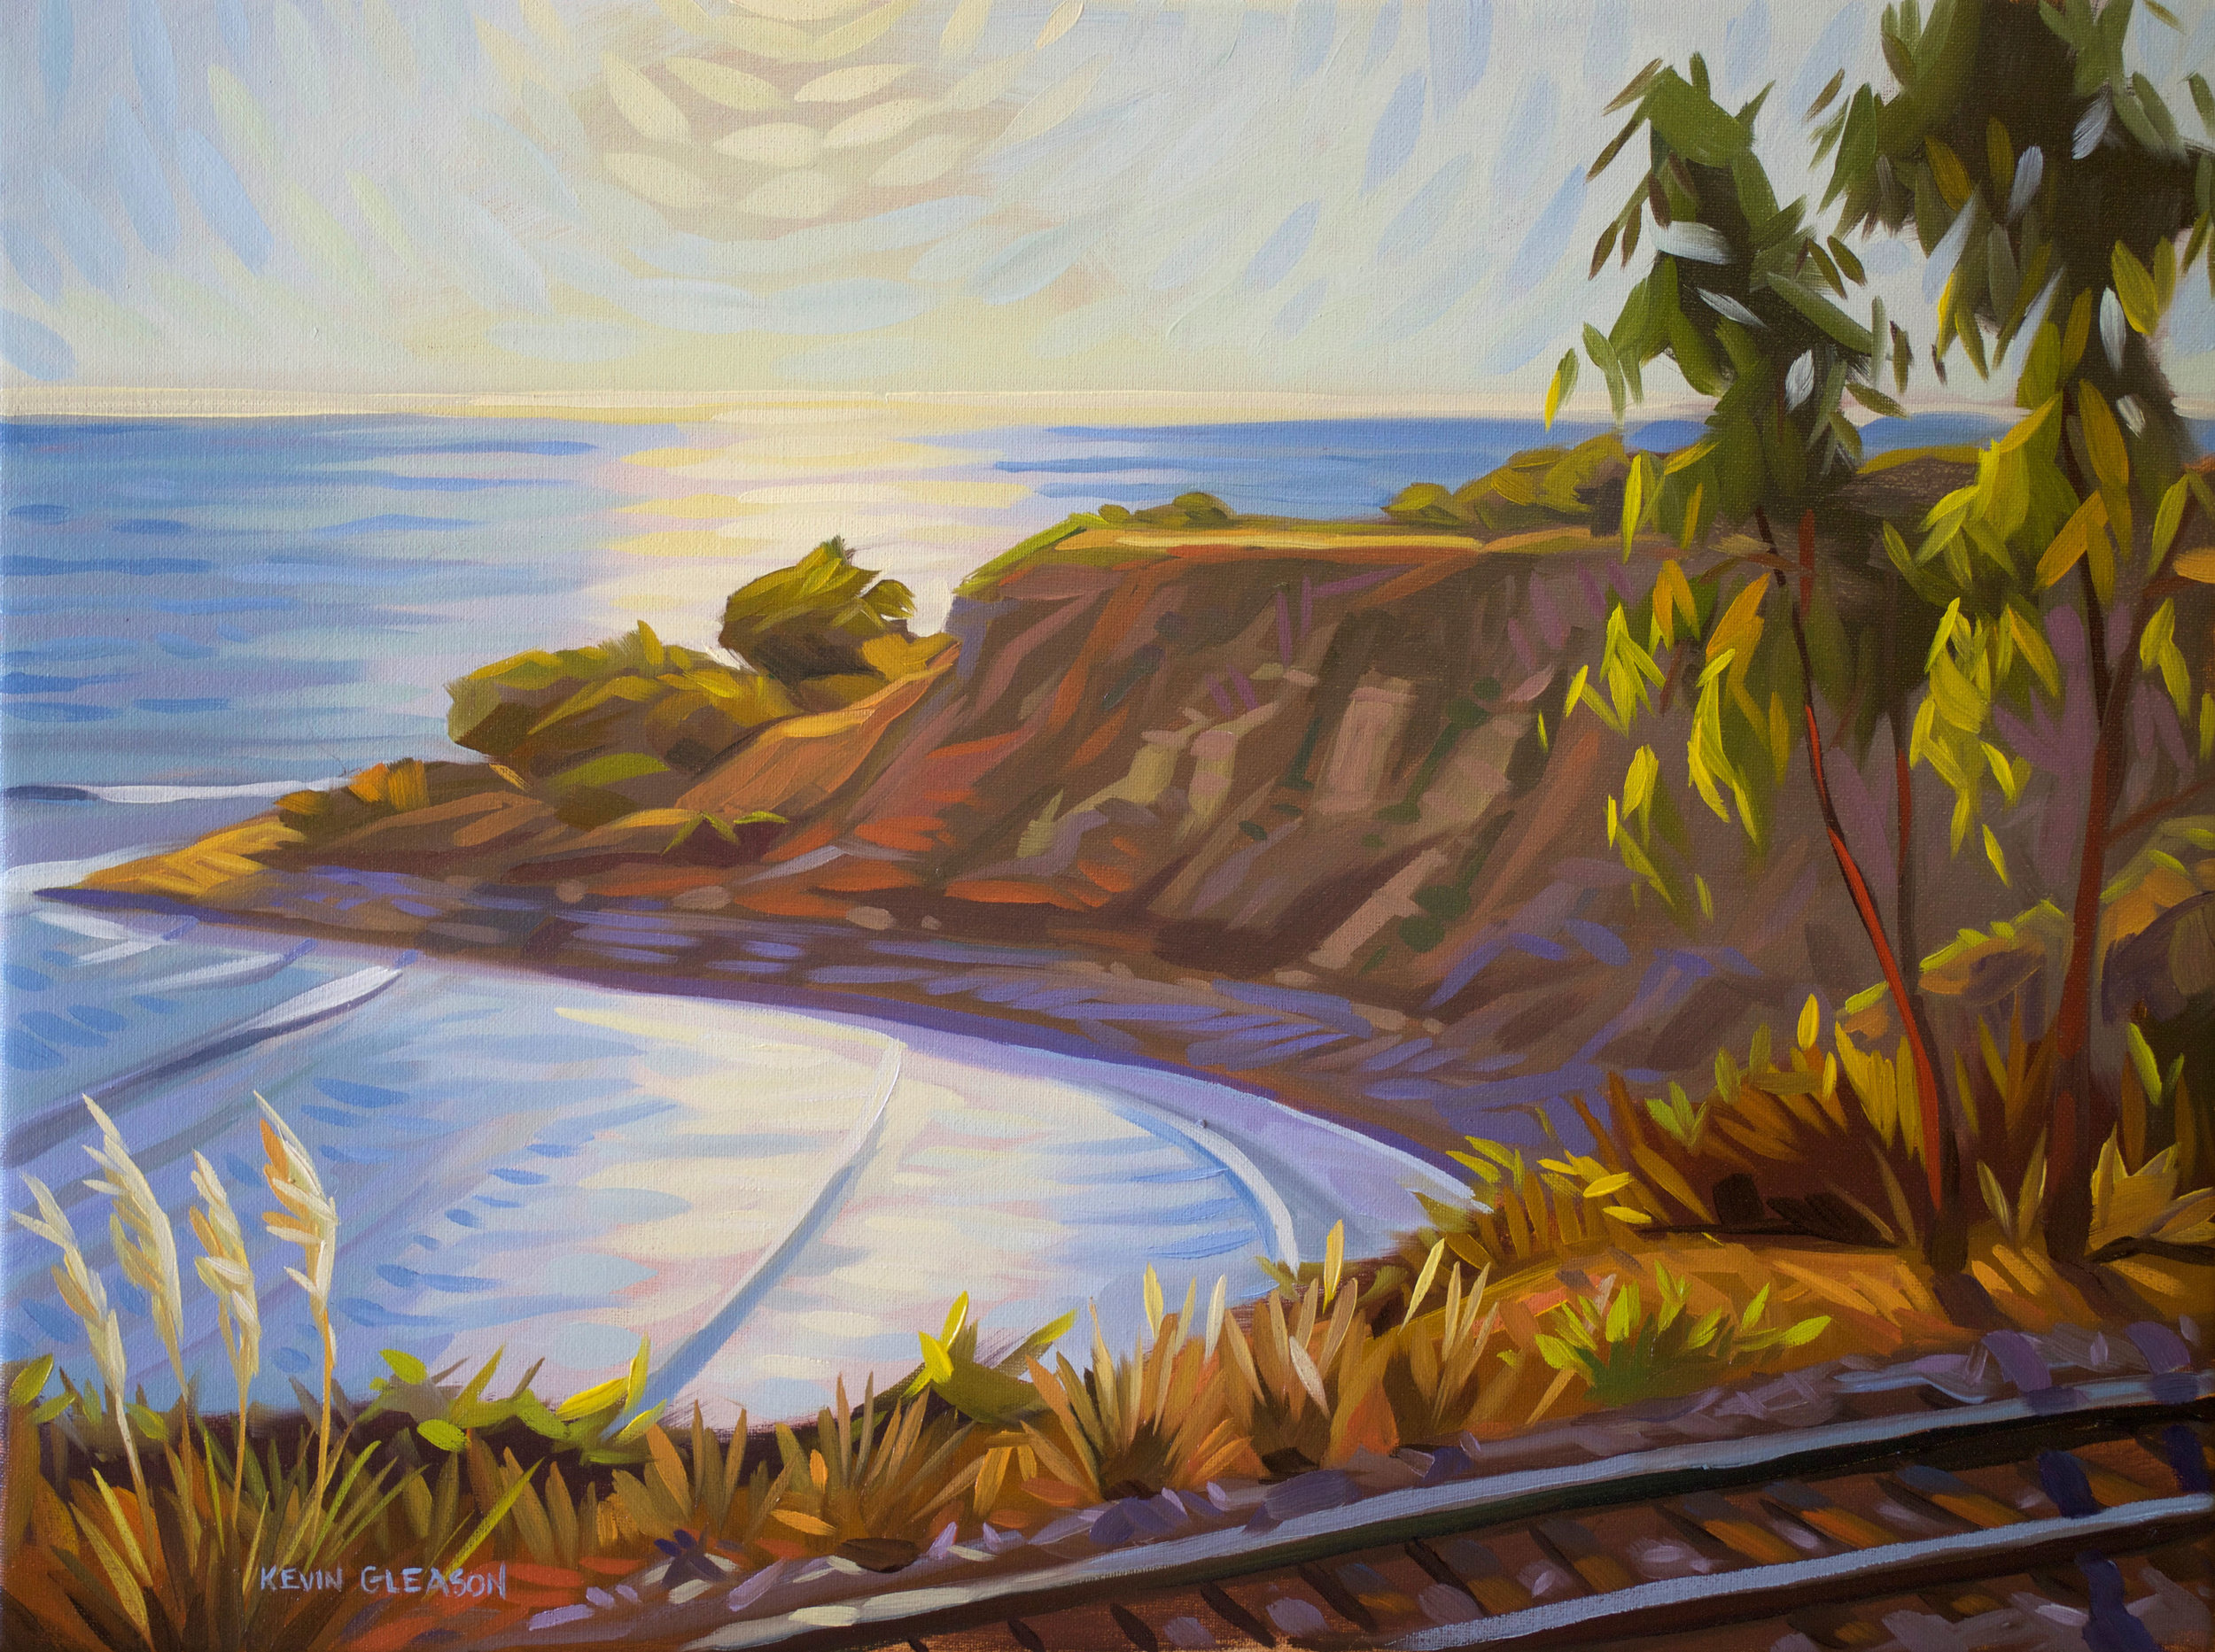 El Capitan Cove, oil, Kevin Gleason